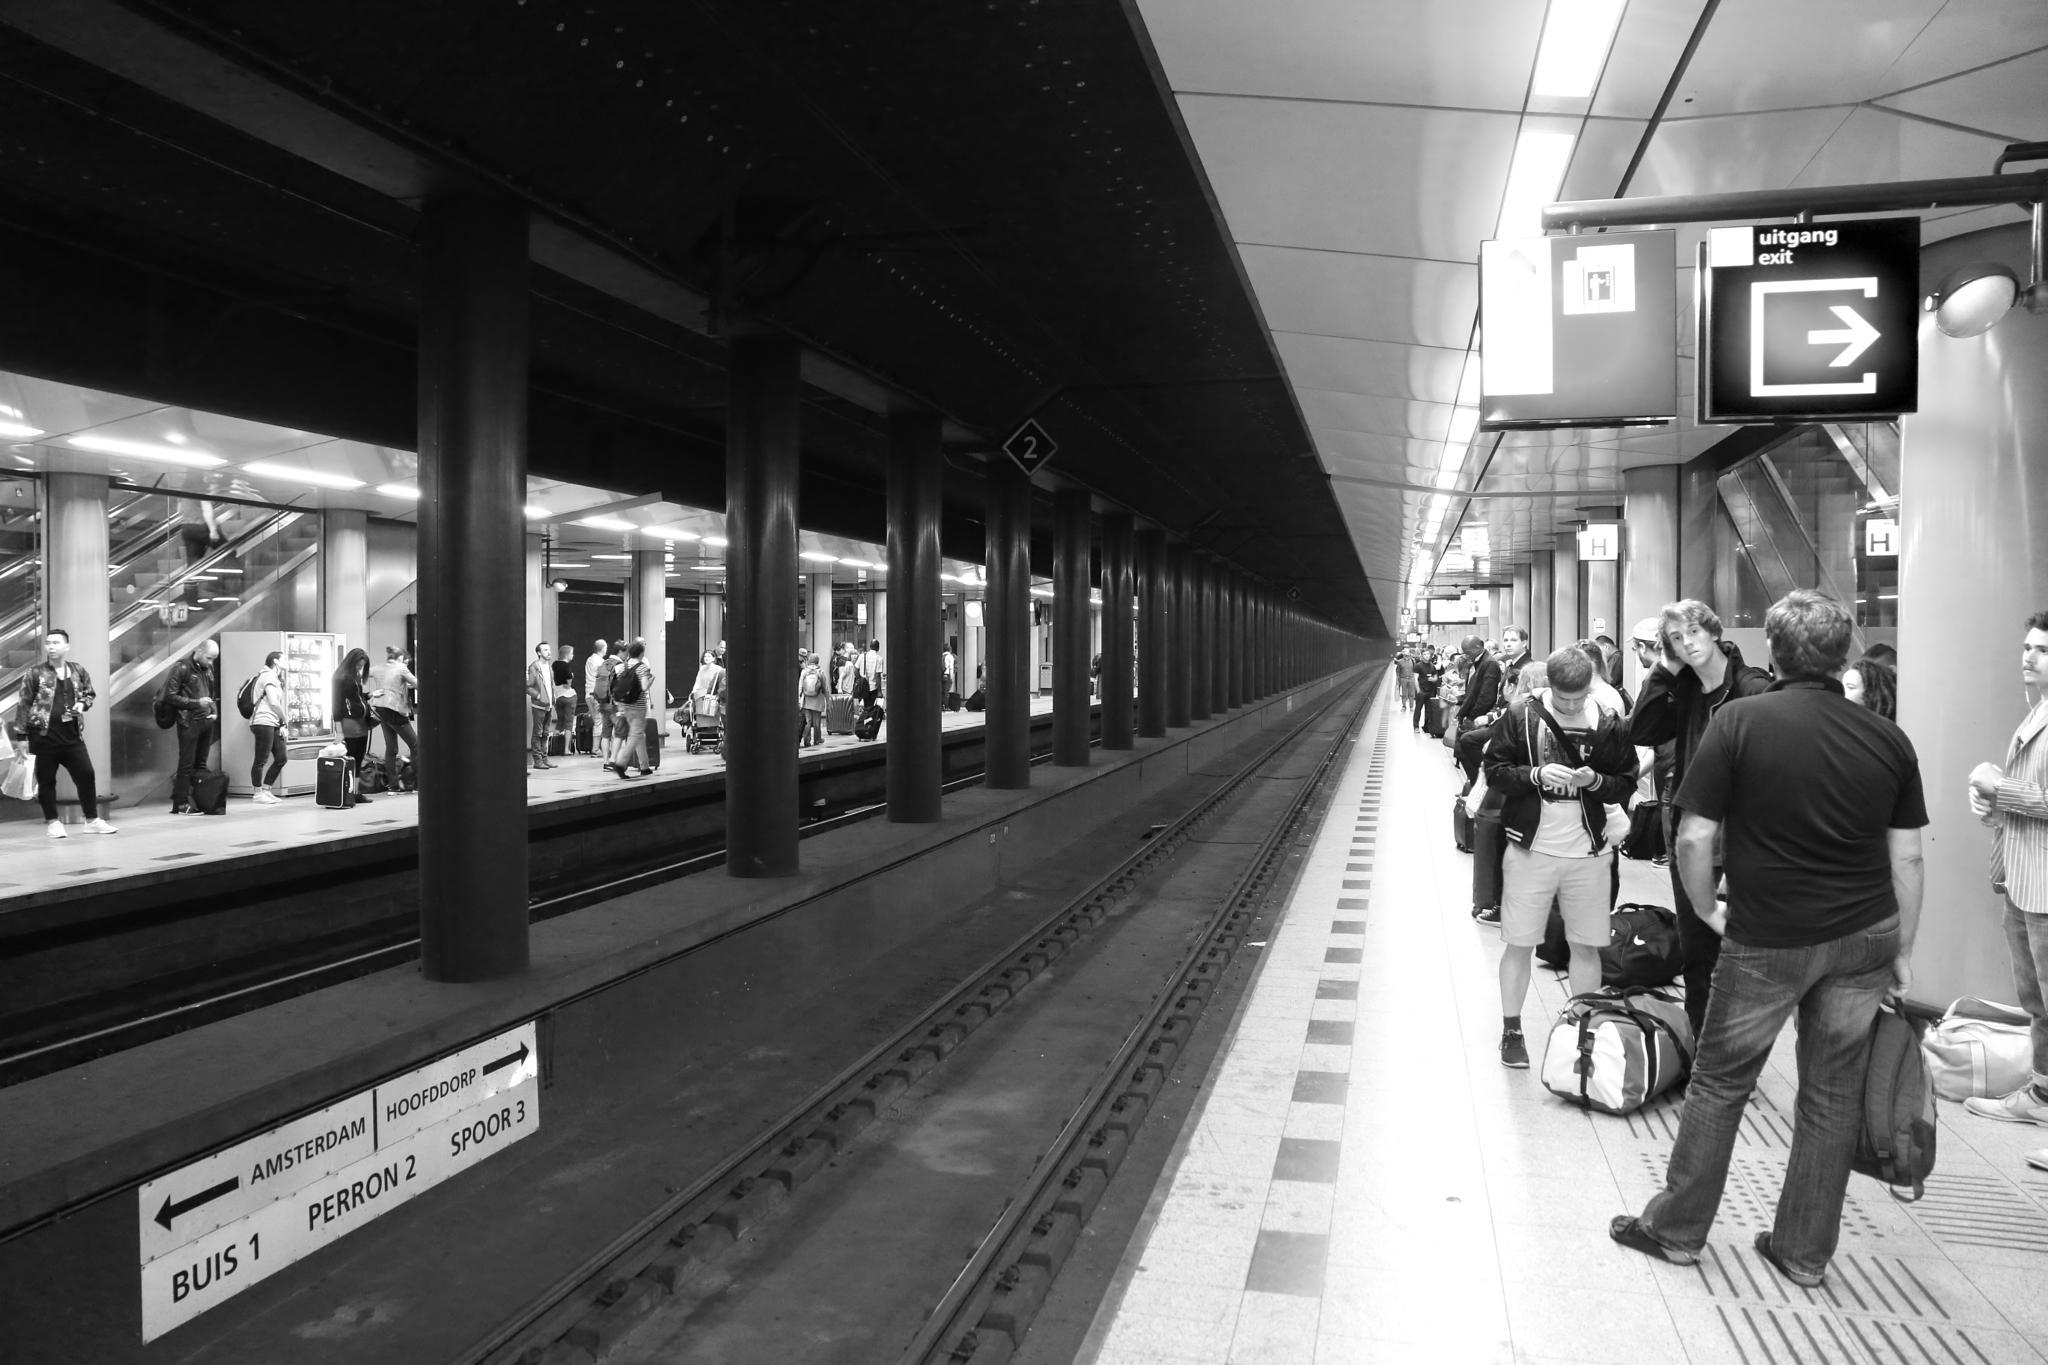 Schipol Train Station by Neil Bartlett